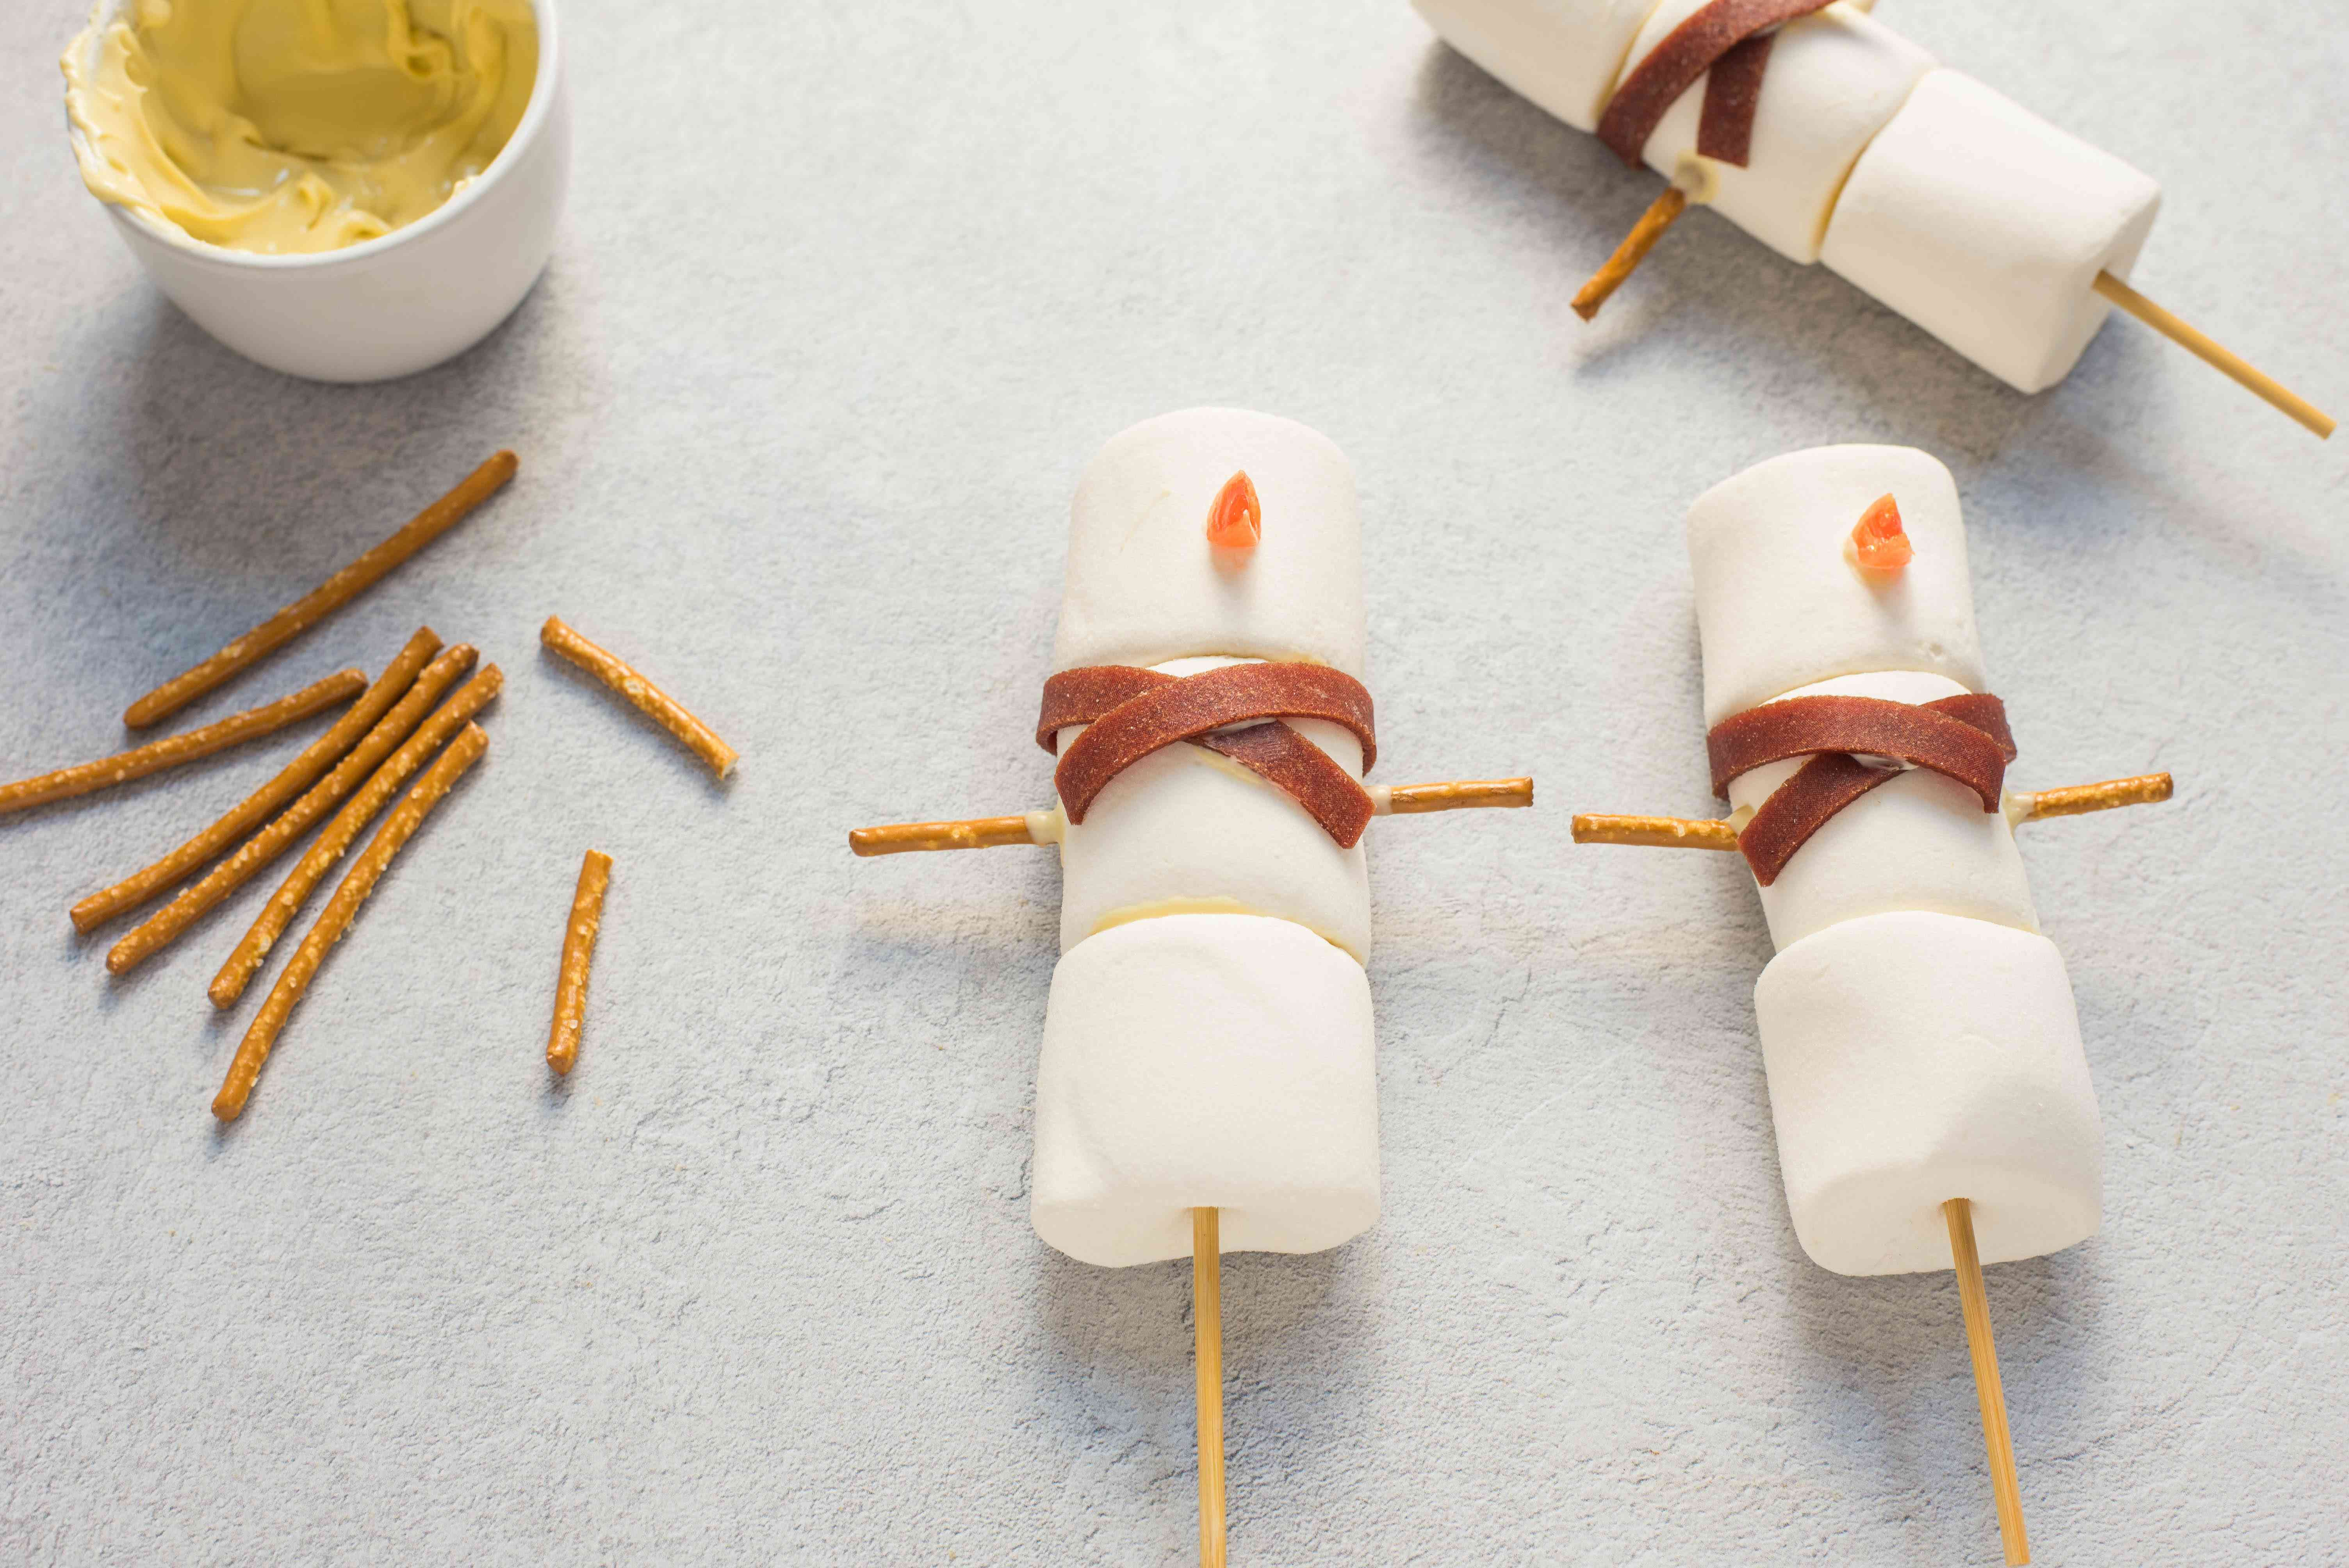 Cut pretzel sticks in half